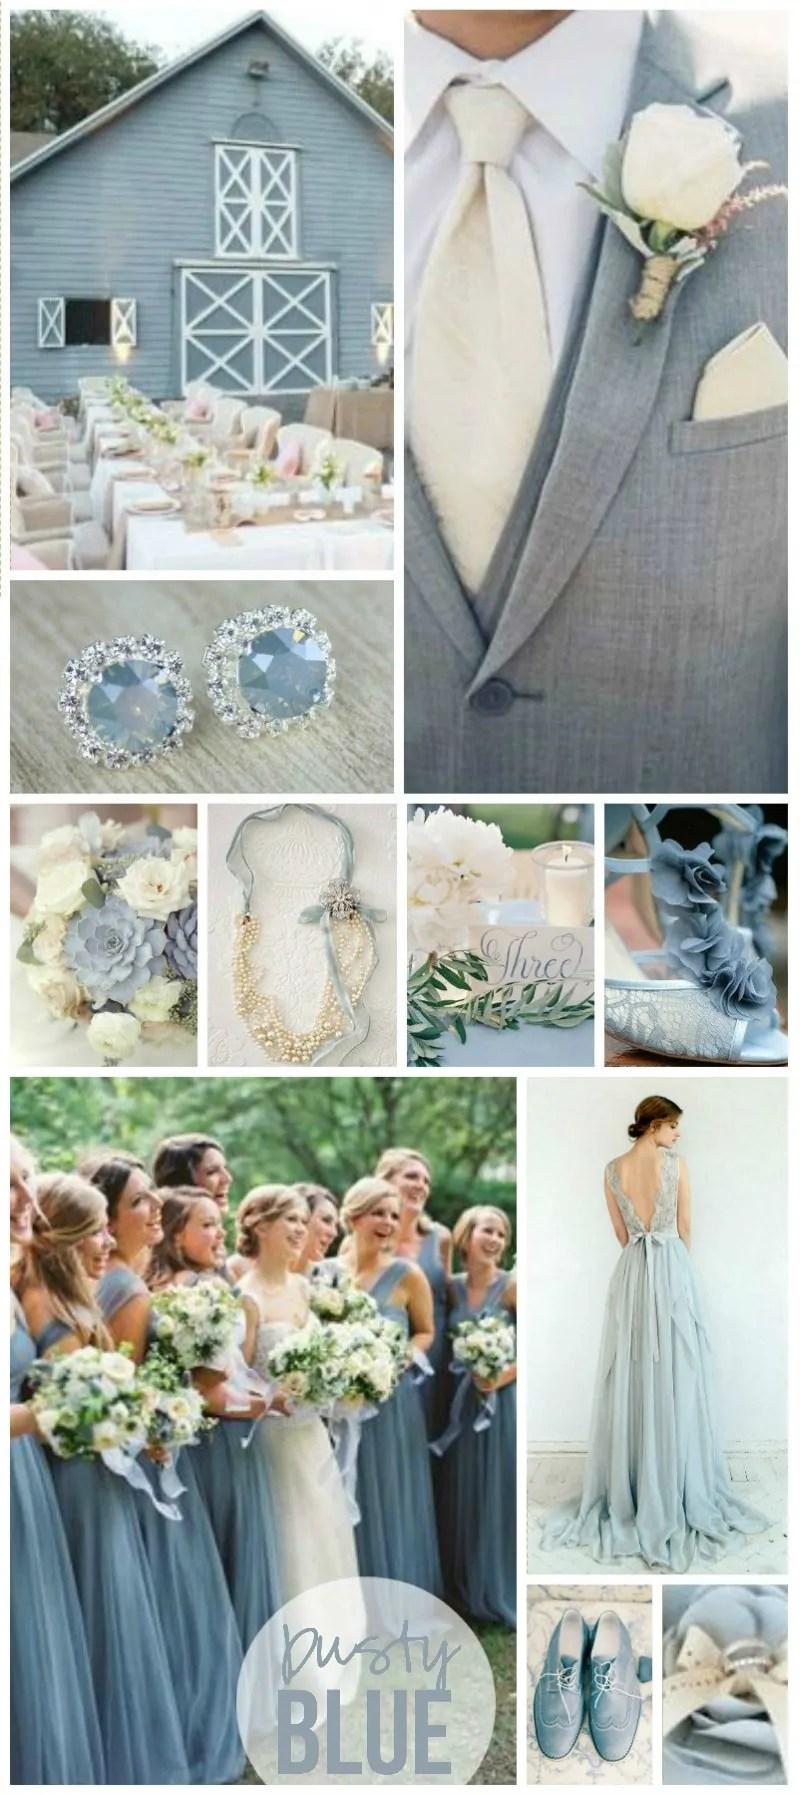 Free Wedding Inspiration Board Maker | Invitationsjdi org